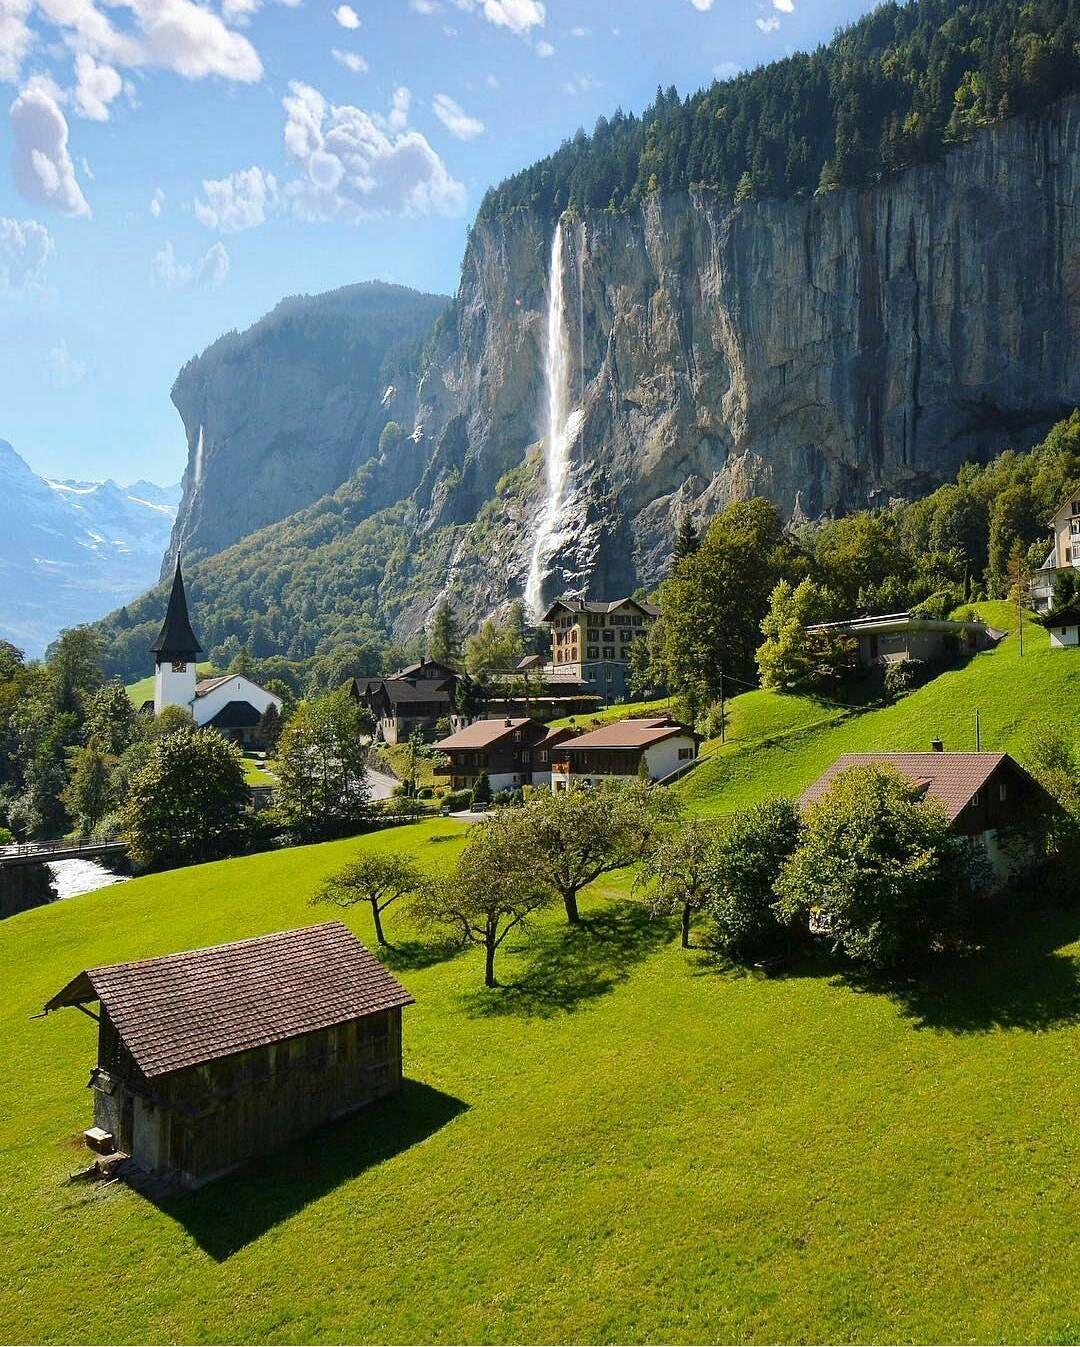 Amazing Places To Stay Switzerland: Lauterbrunnen, Switzerland Photo: @sennarelax Amazing Shot